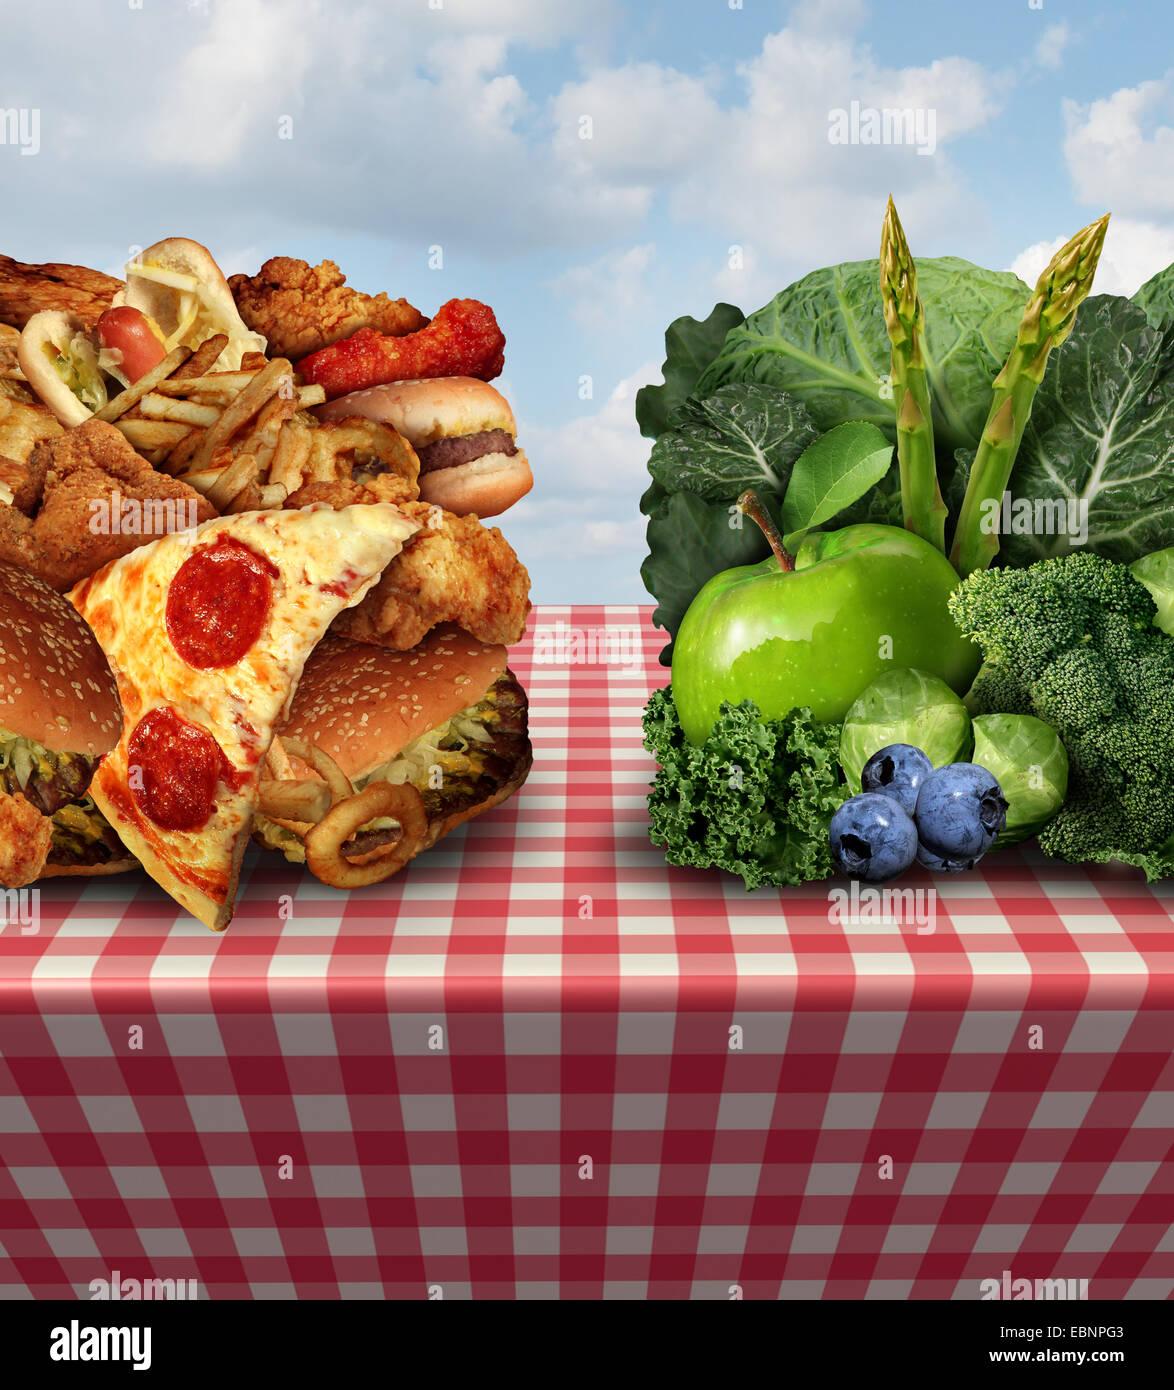 Concepto de vida sana y dieta símbolo decisión o elección de alimentos saludables dilema entre buena Imagen De Stock